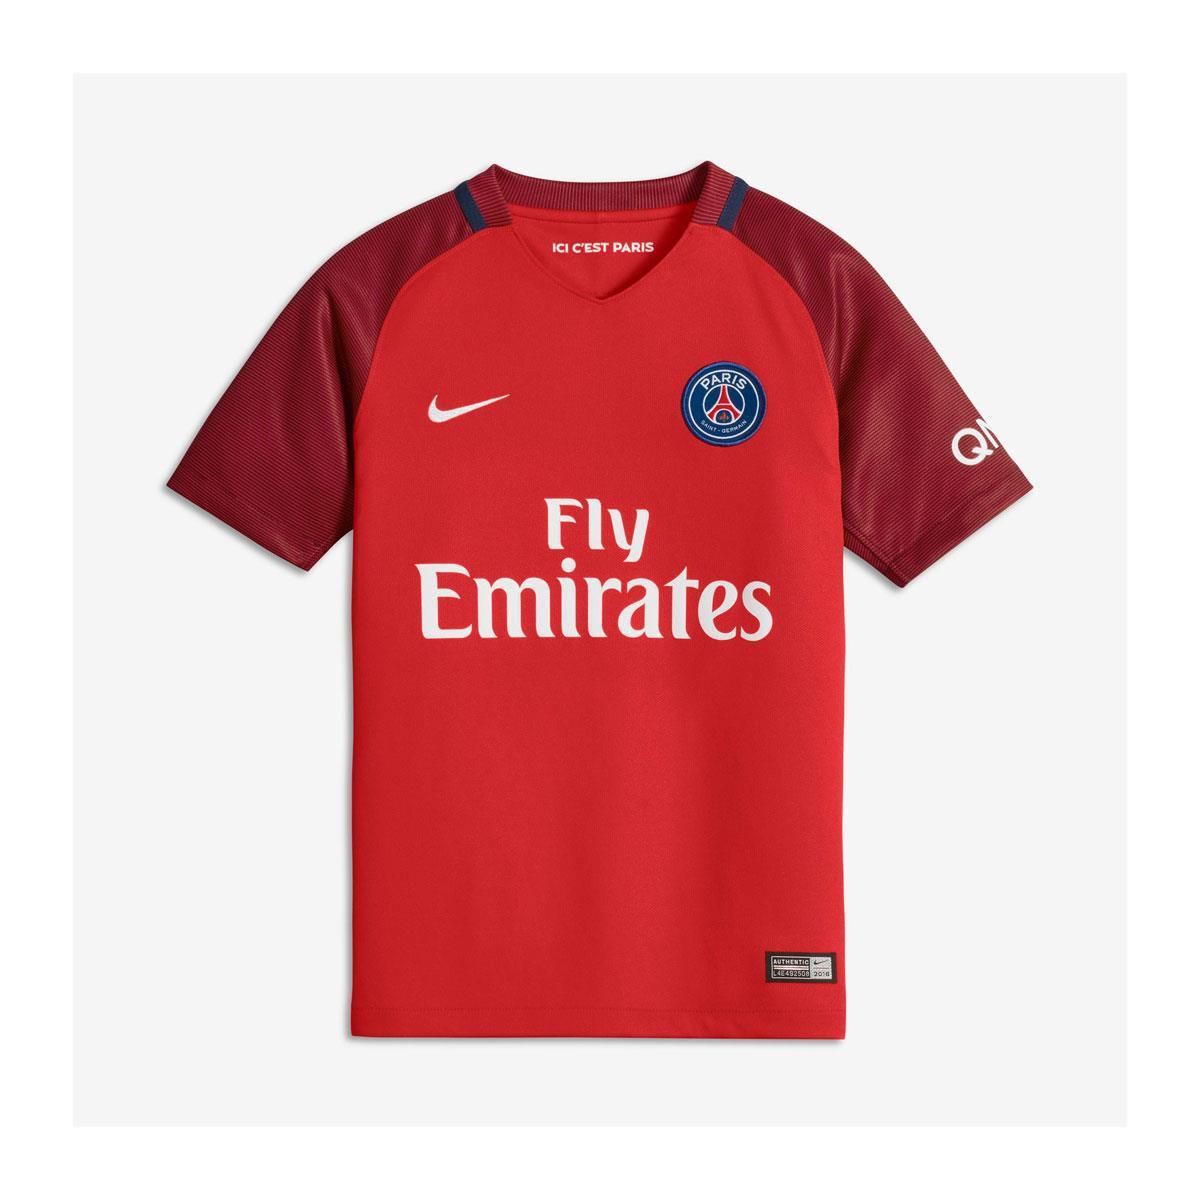 ee5b68bf9 Camisa Nike PSG II 2016 2017 Vermelha Infantil